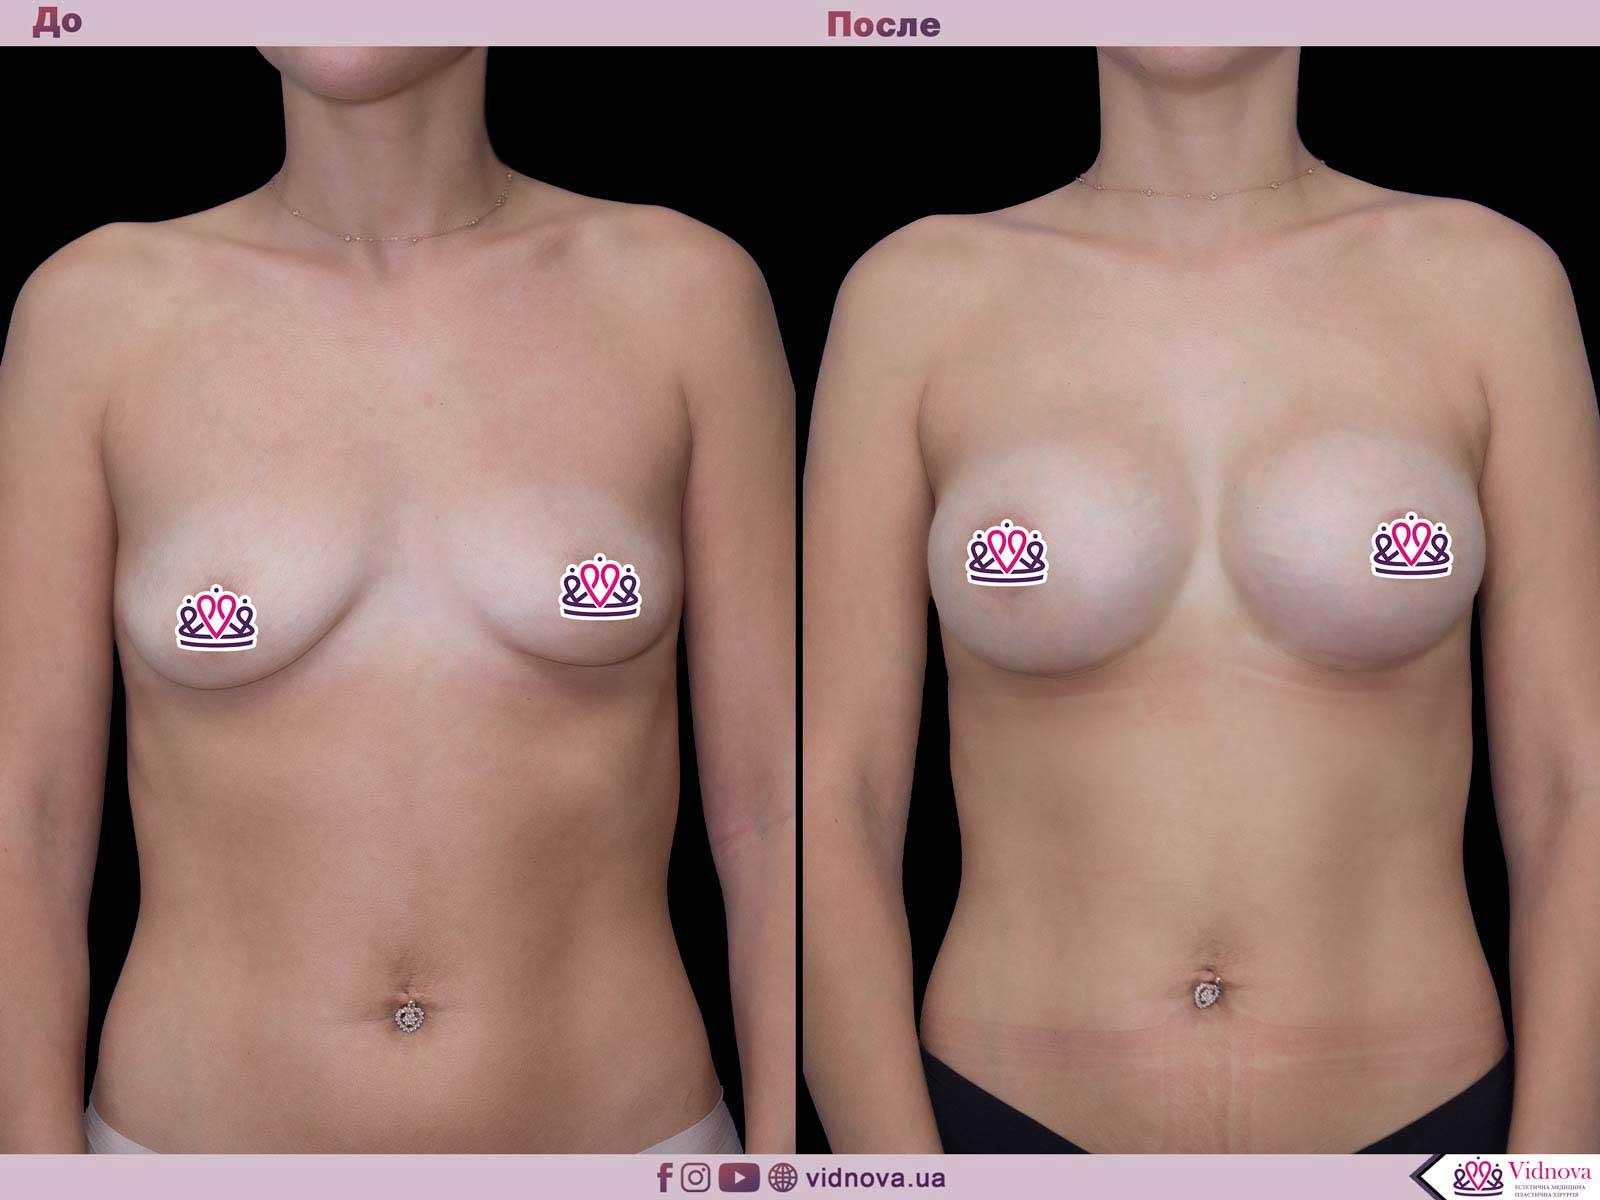 Увеличение груди: Фото ДО и ПОСЛЕ - Пример №43-1 - Клиника Vidnova